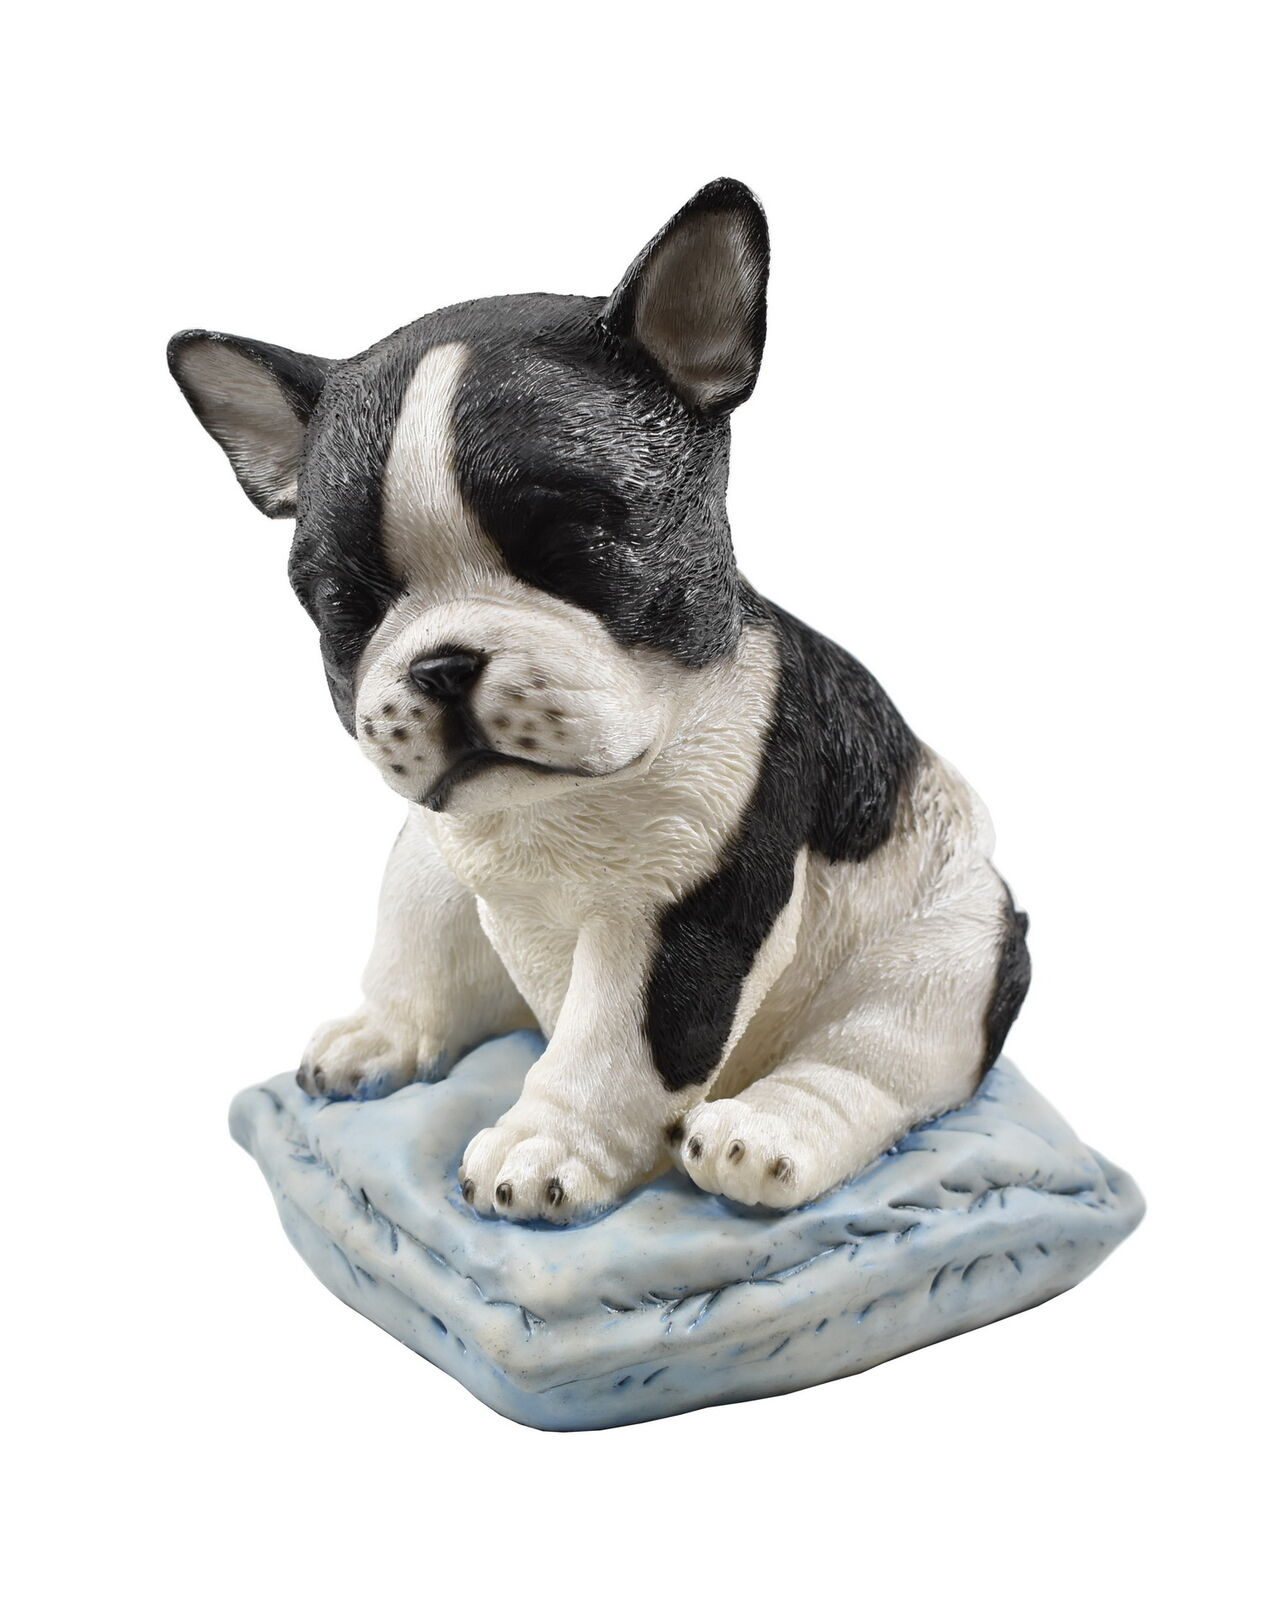 bulldogge bull dogge hund welpe deko garten tier figur skulptur mops terrier